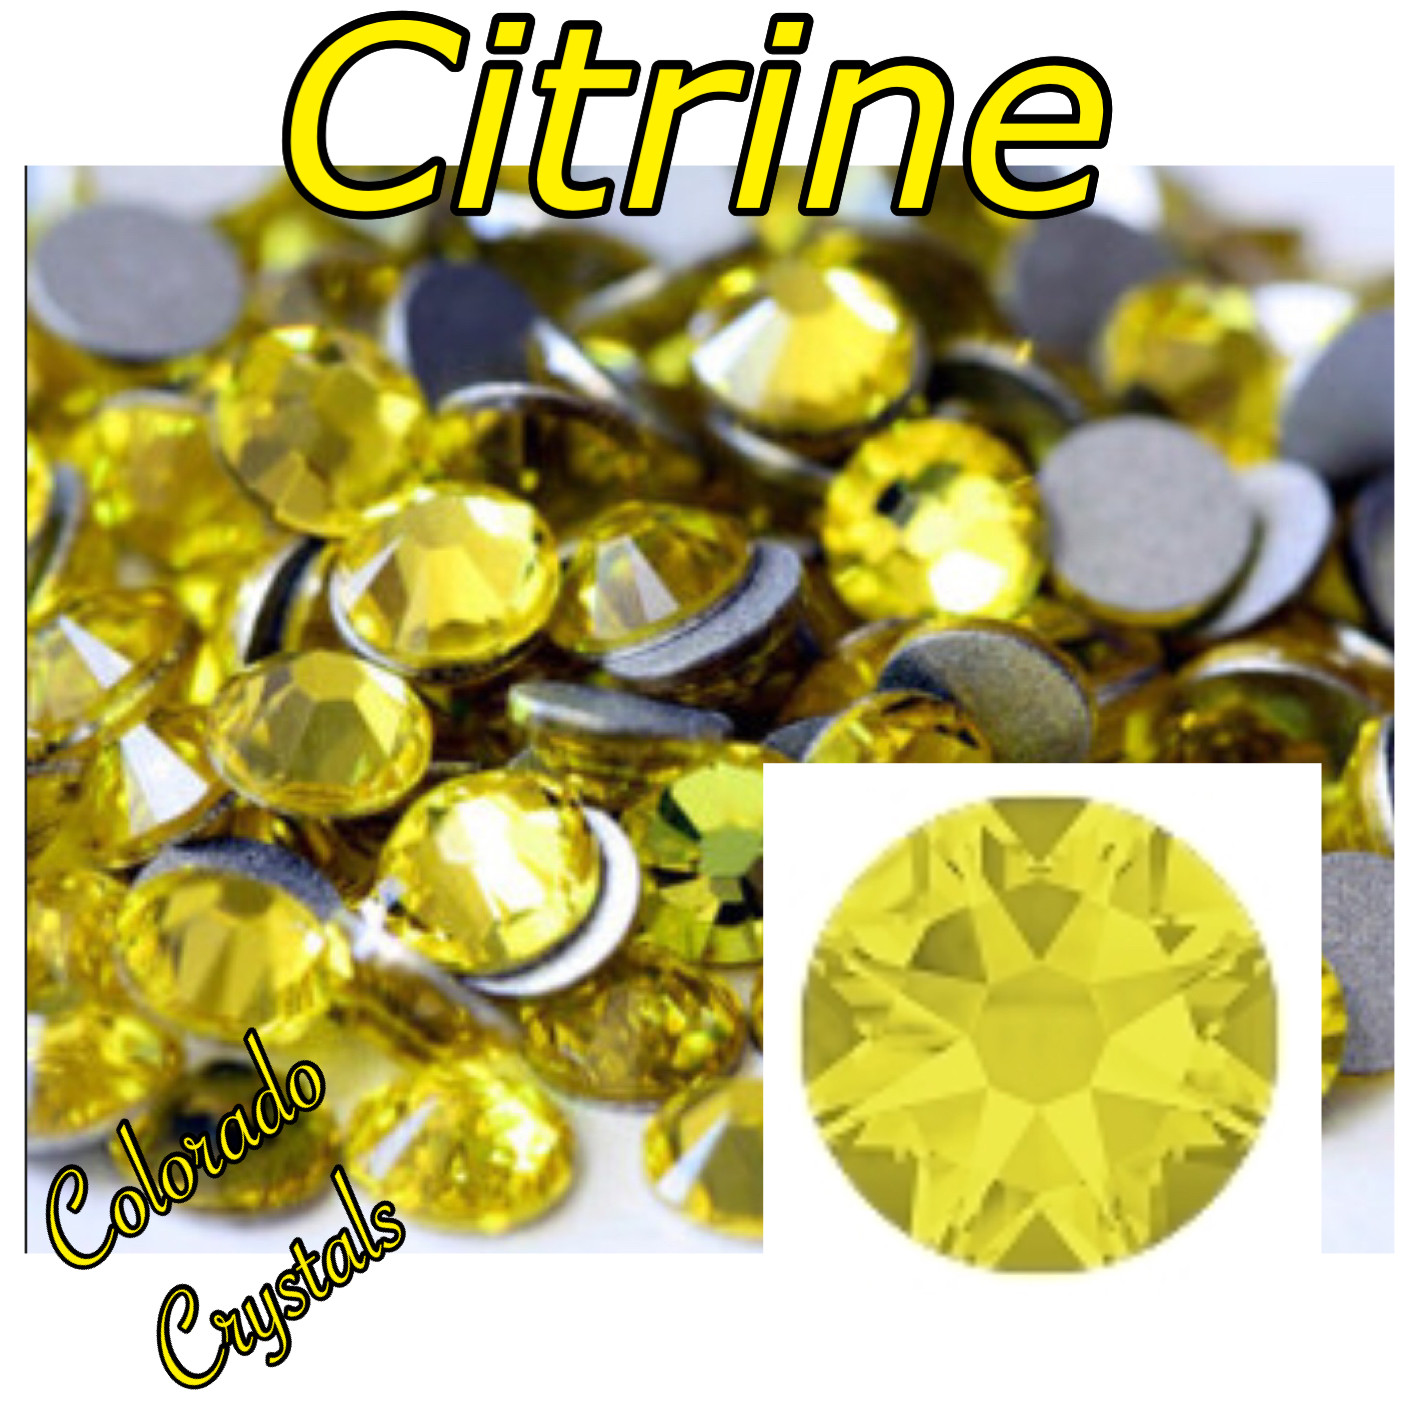 Citrine 20ss 2088 Limited Yellow Rhinestones Swarovski